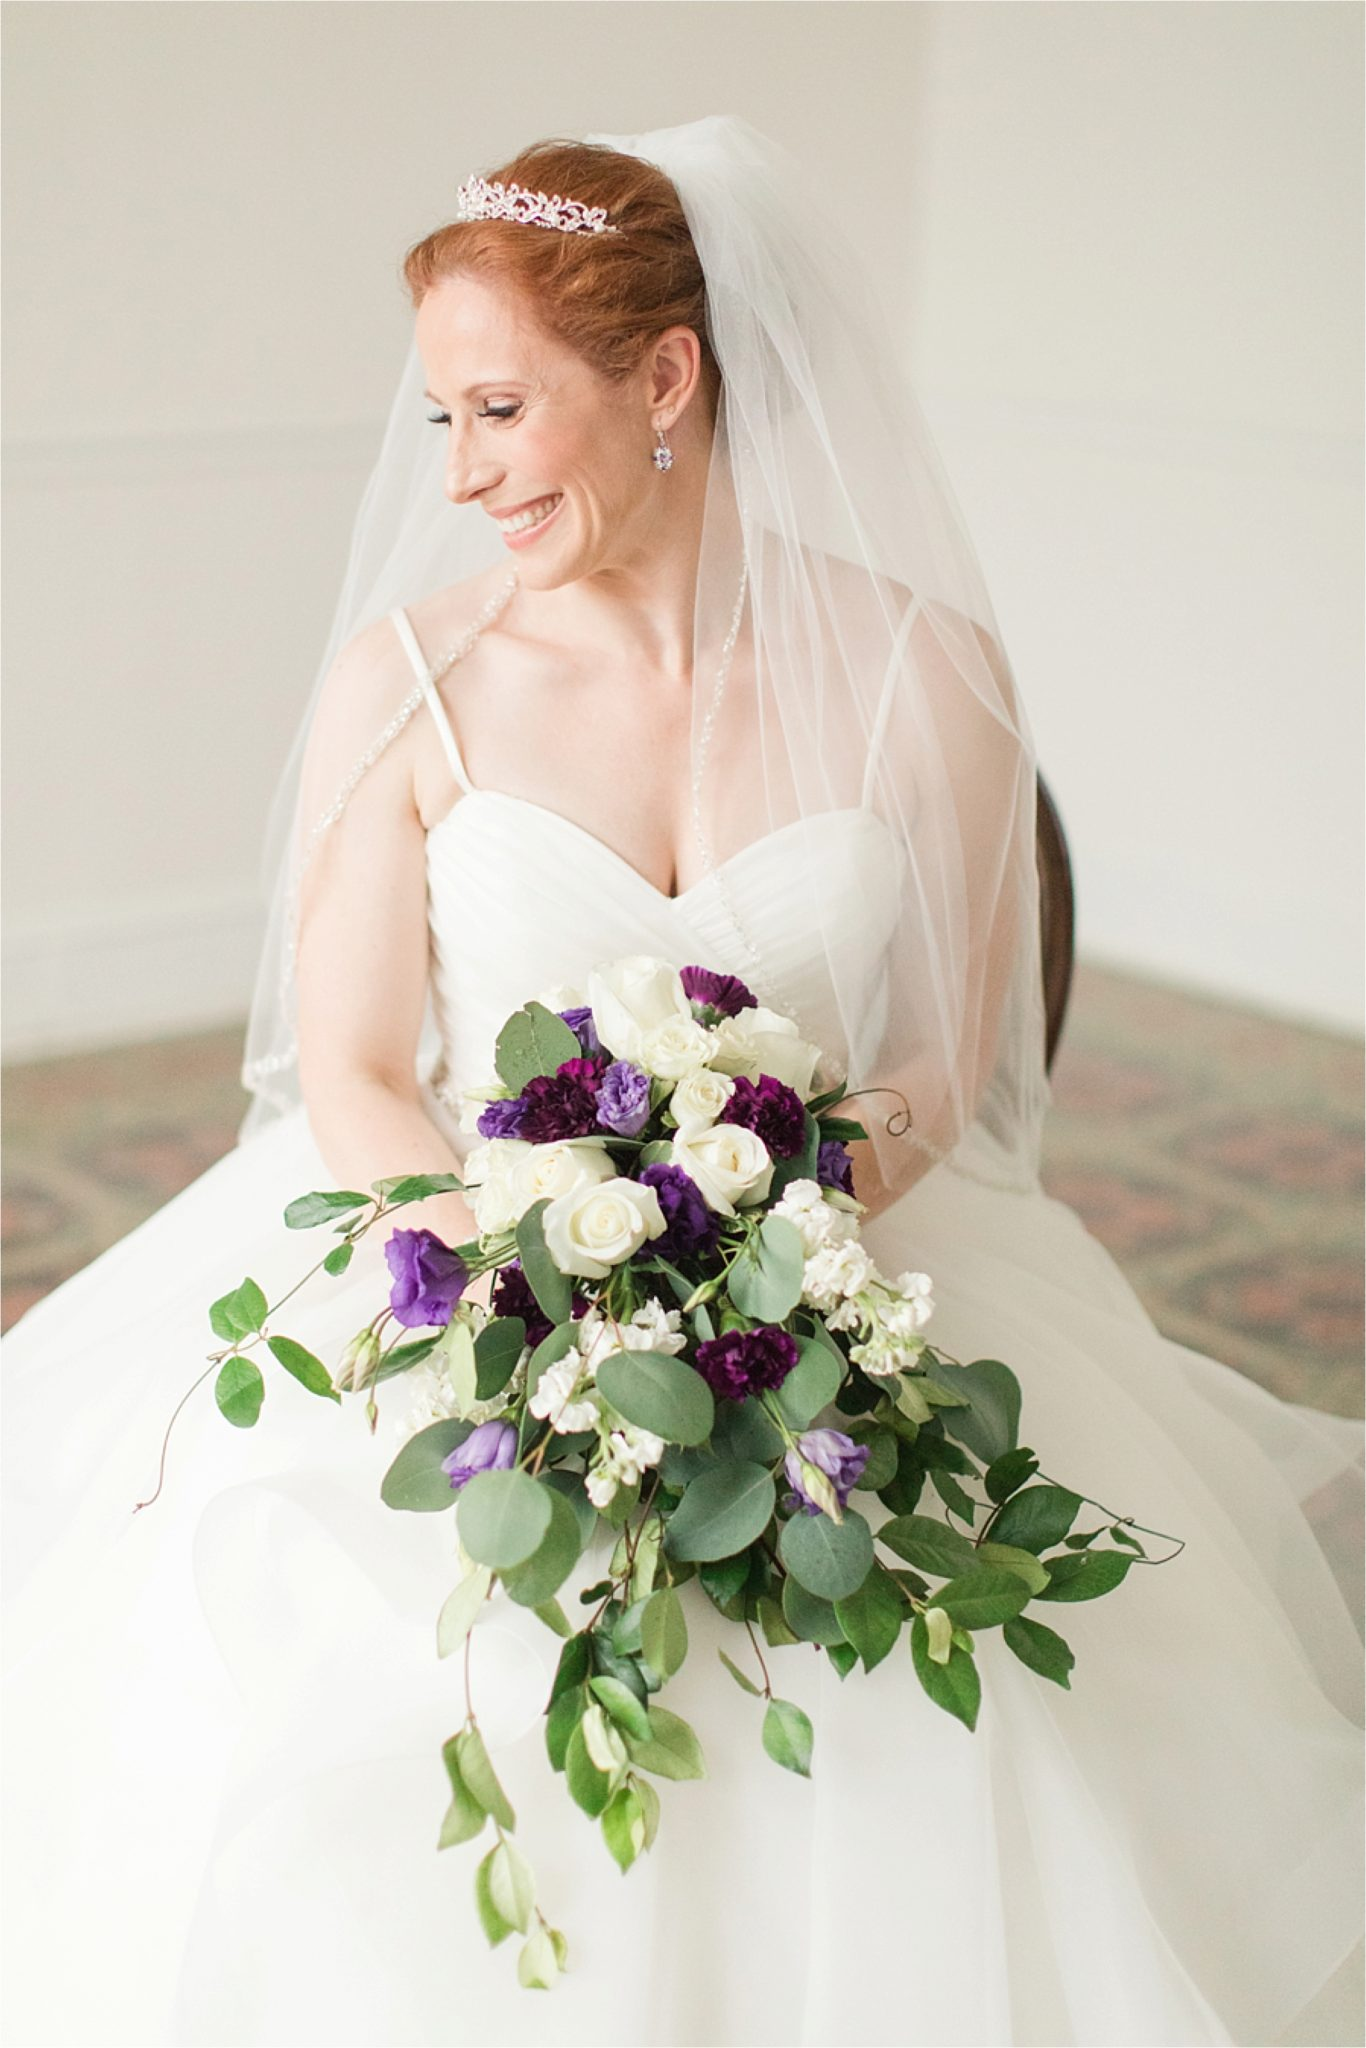 Bridal Session at The Pillars of Mobile-Mobile Alabama Wedding Photographer-Sarra-Bridal session-Wedding dress-Bridal bouquet